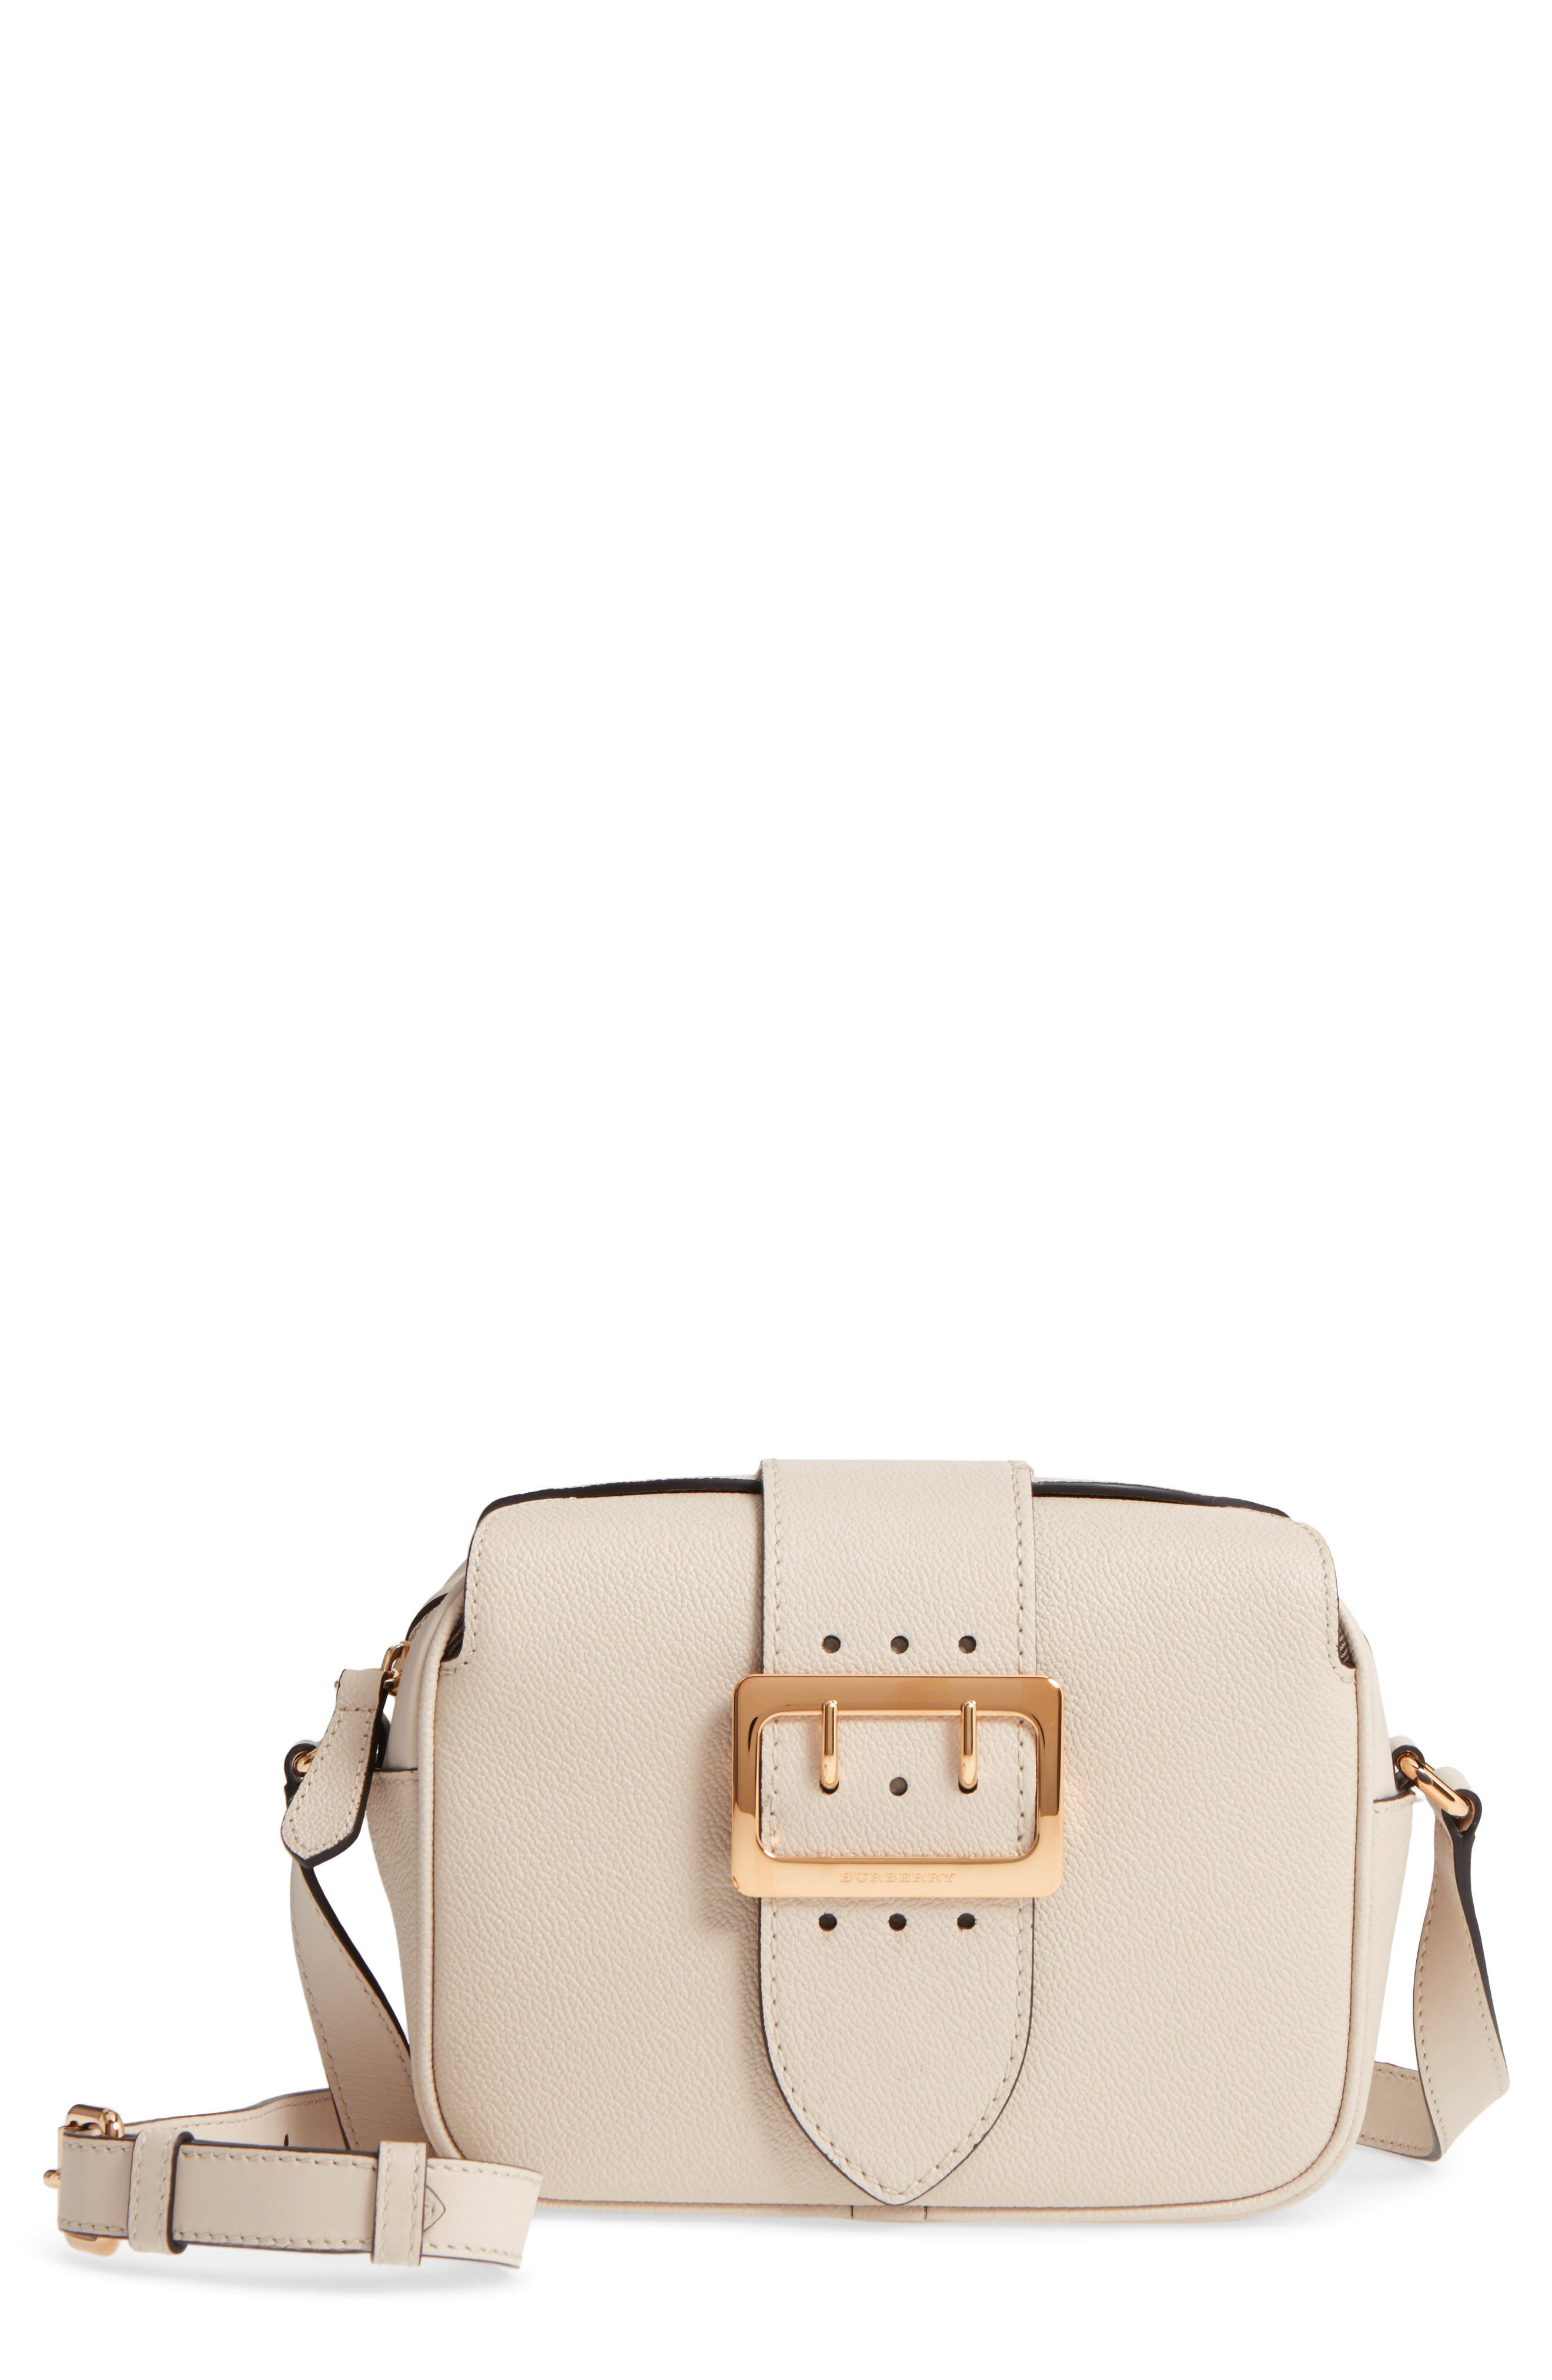 Main Image - Burberry Small Buckle Leather Crossbody Bag